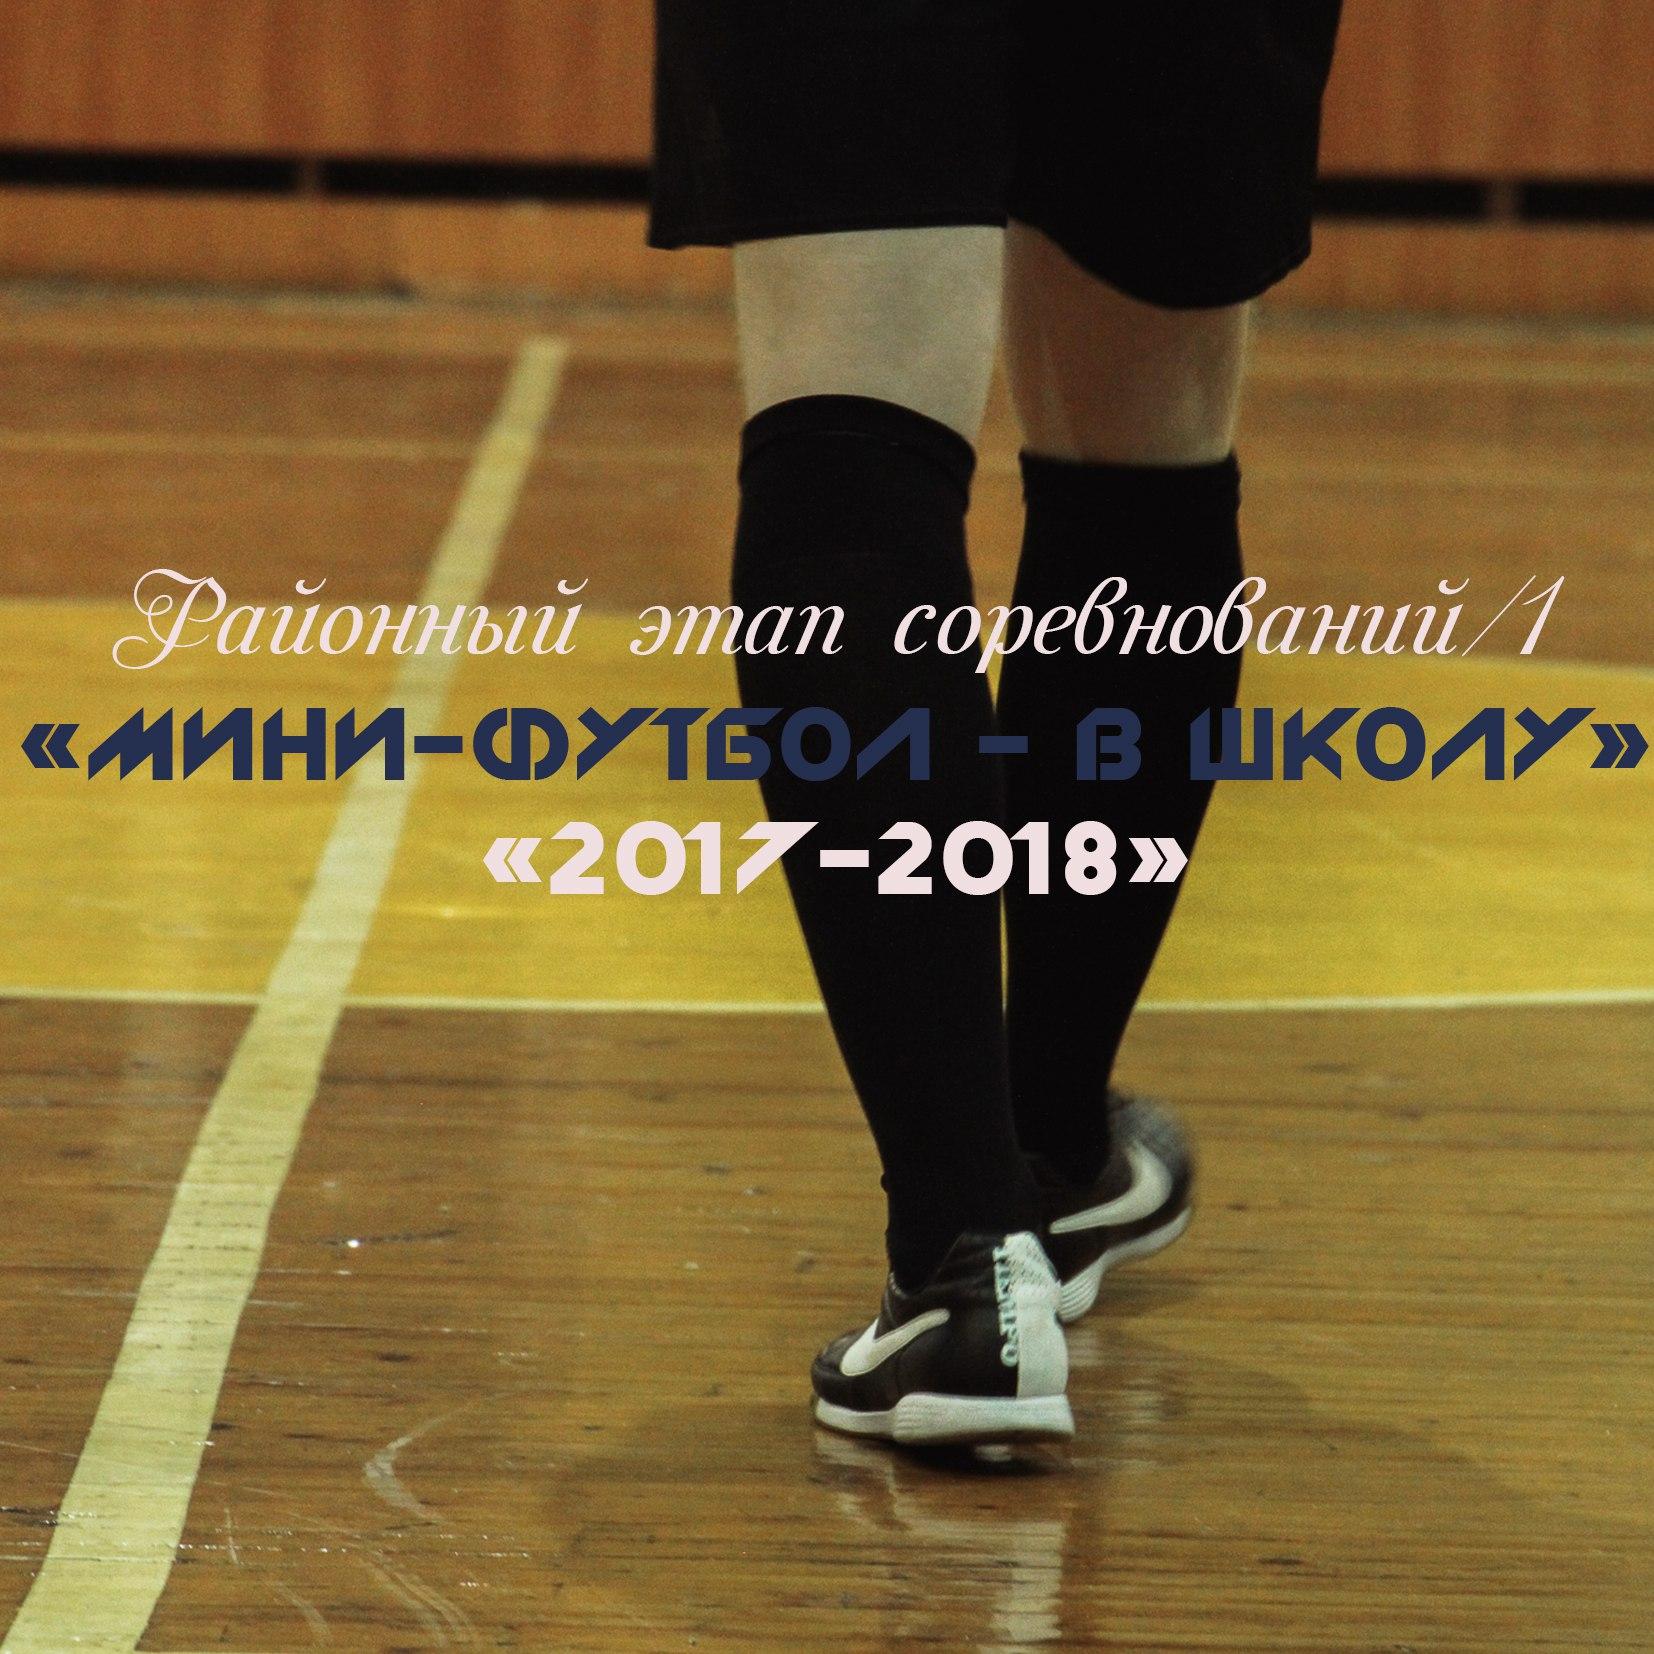 Мини-футбол в школу 2017-2017